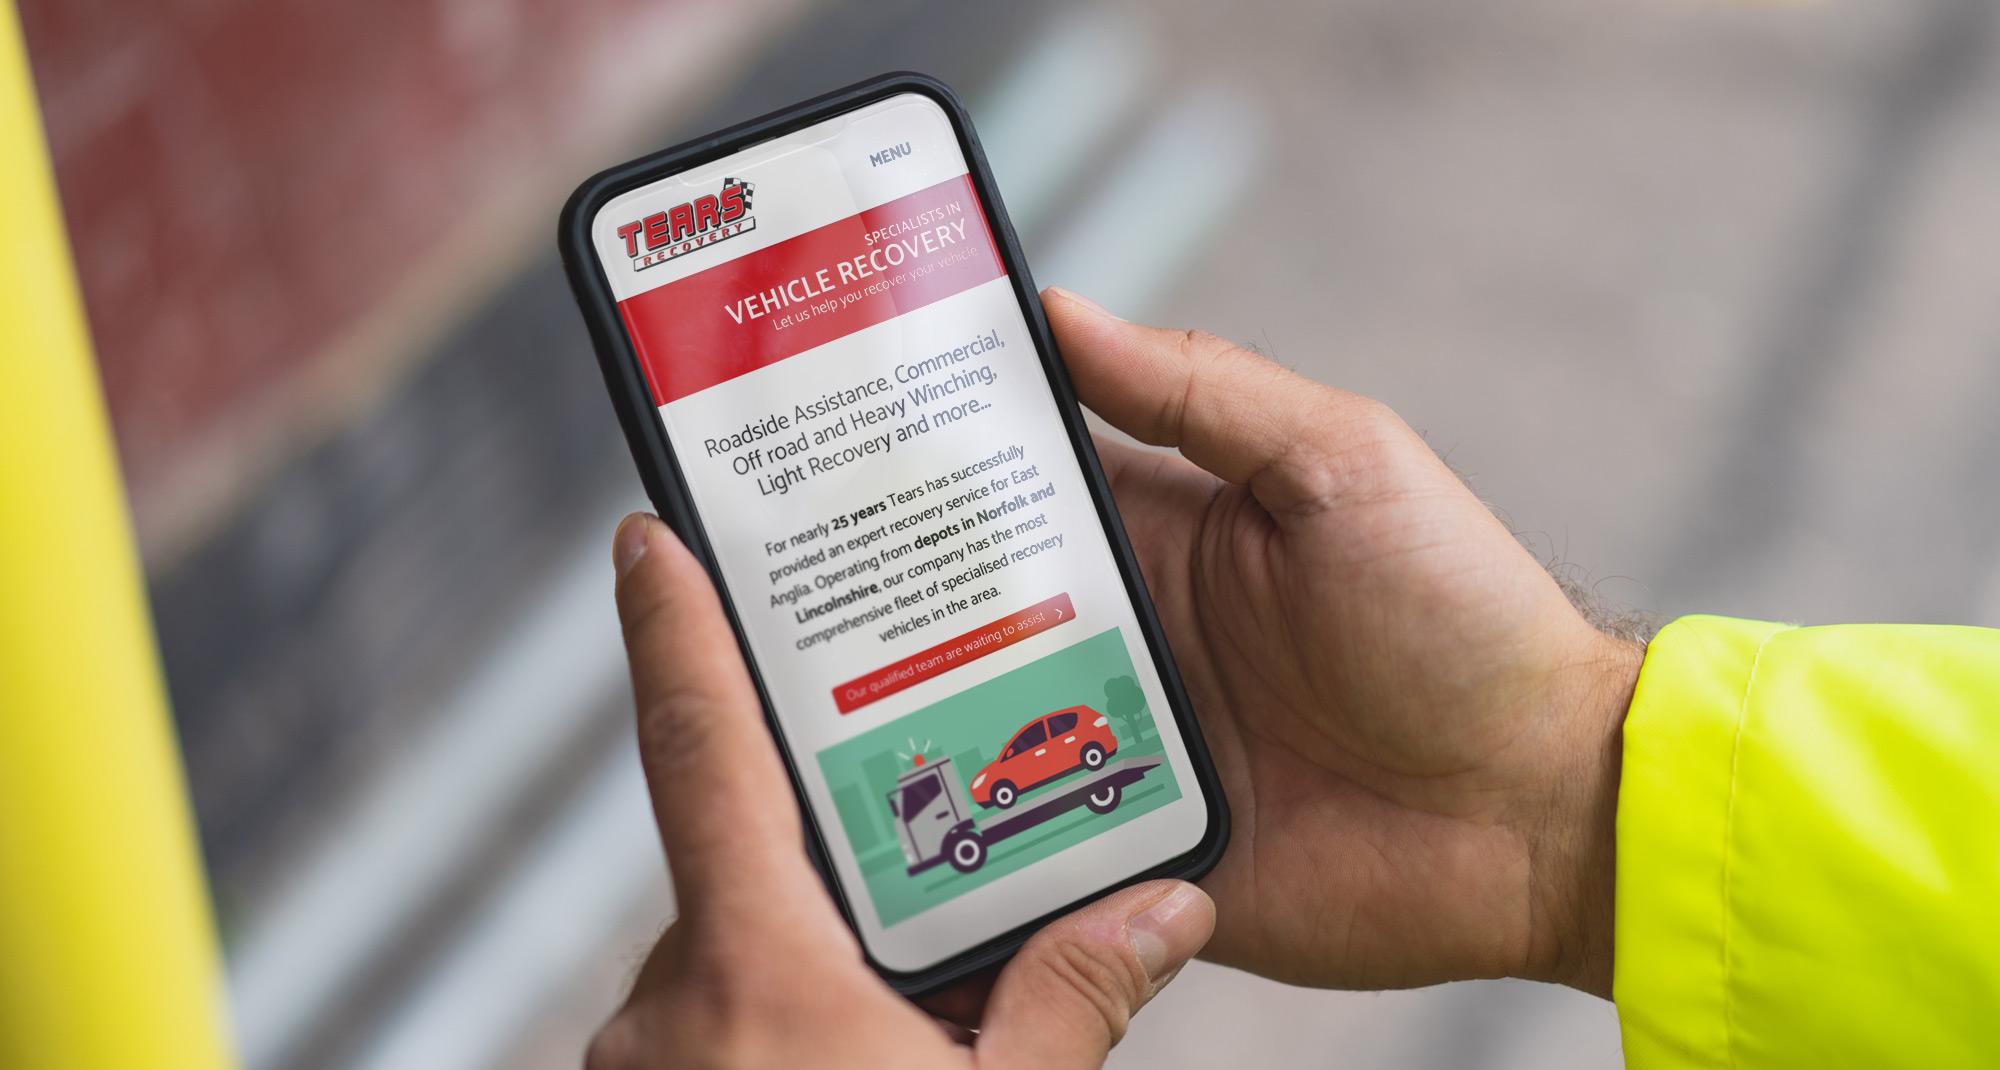 Farm Electronics website on a phone